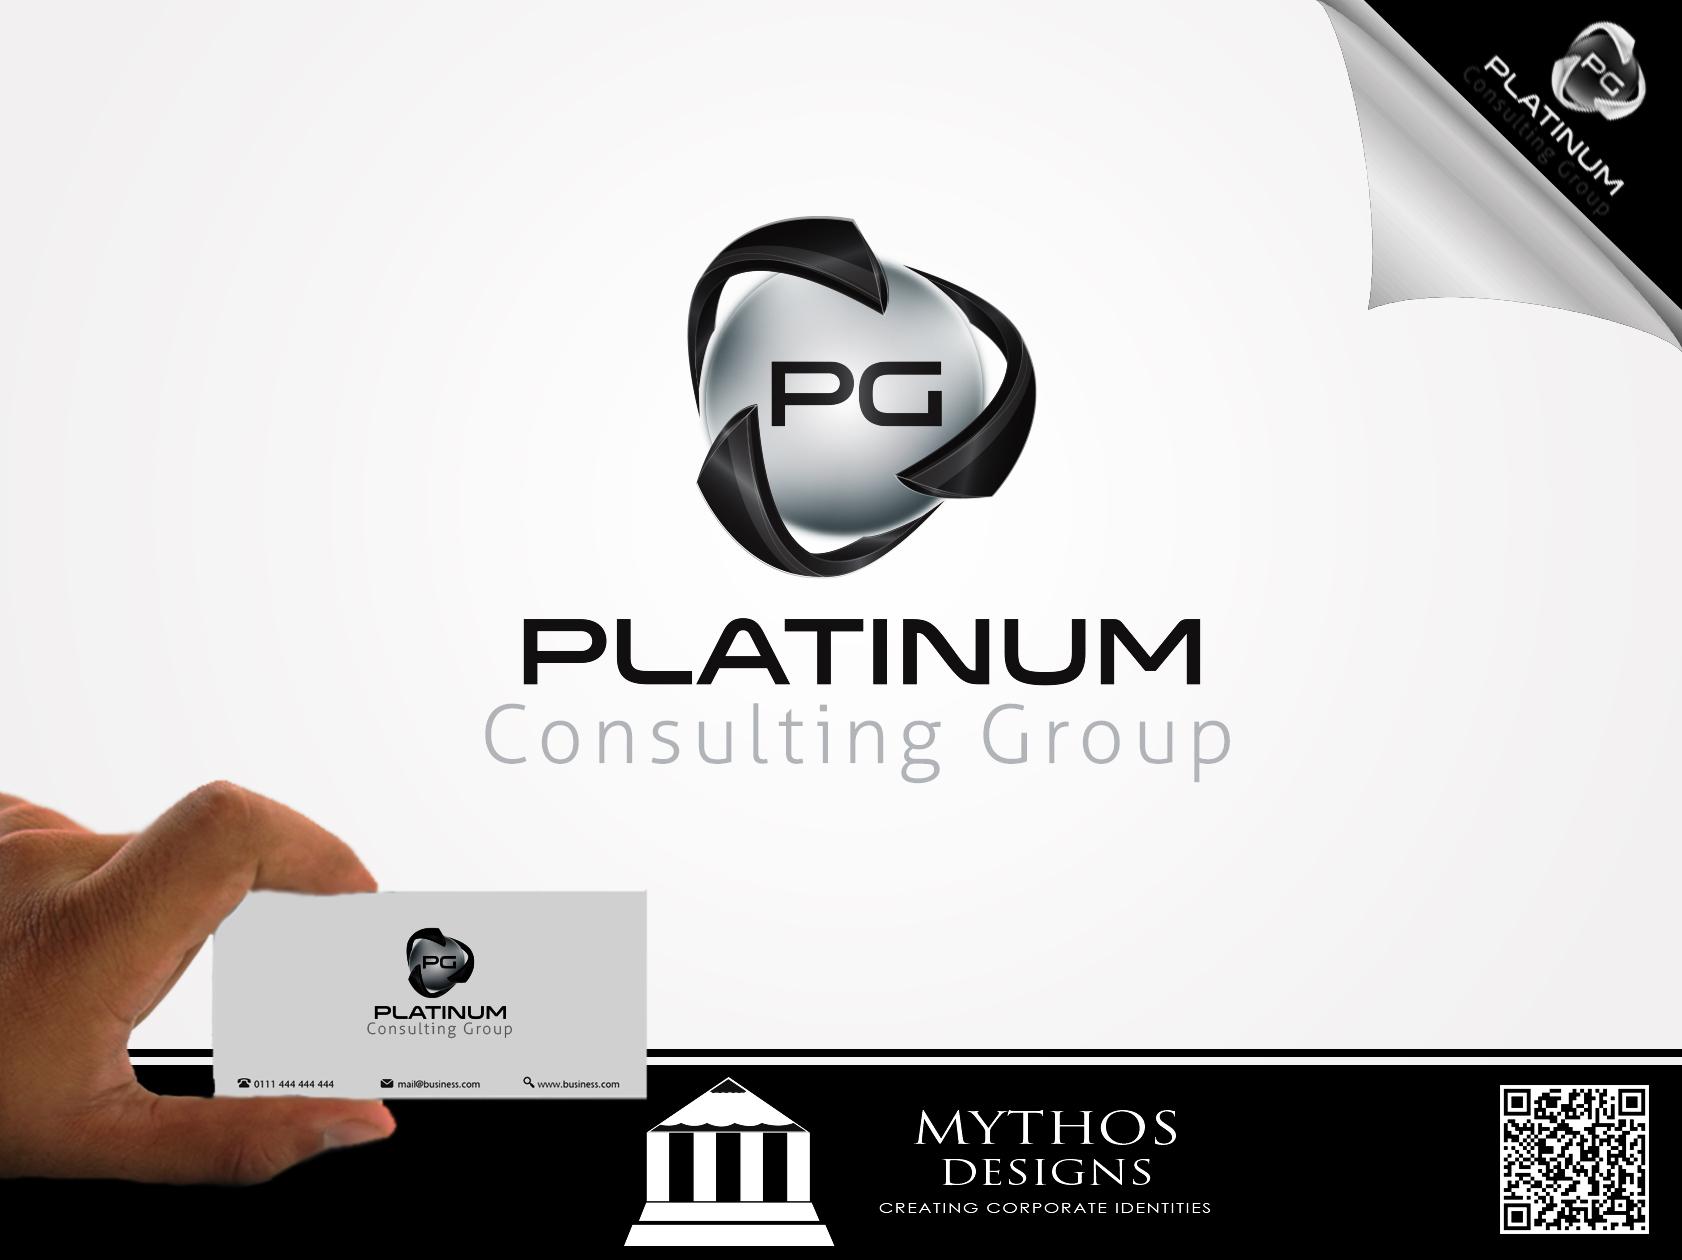 Logo Design by Mythos Designs - Entry No. 18 in the Logo Design Contest Captivating Logo Design for Platinum Consulting Group.